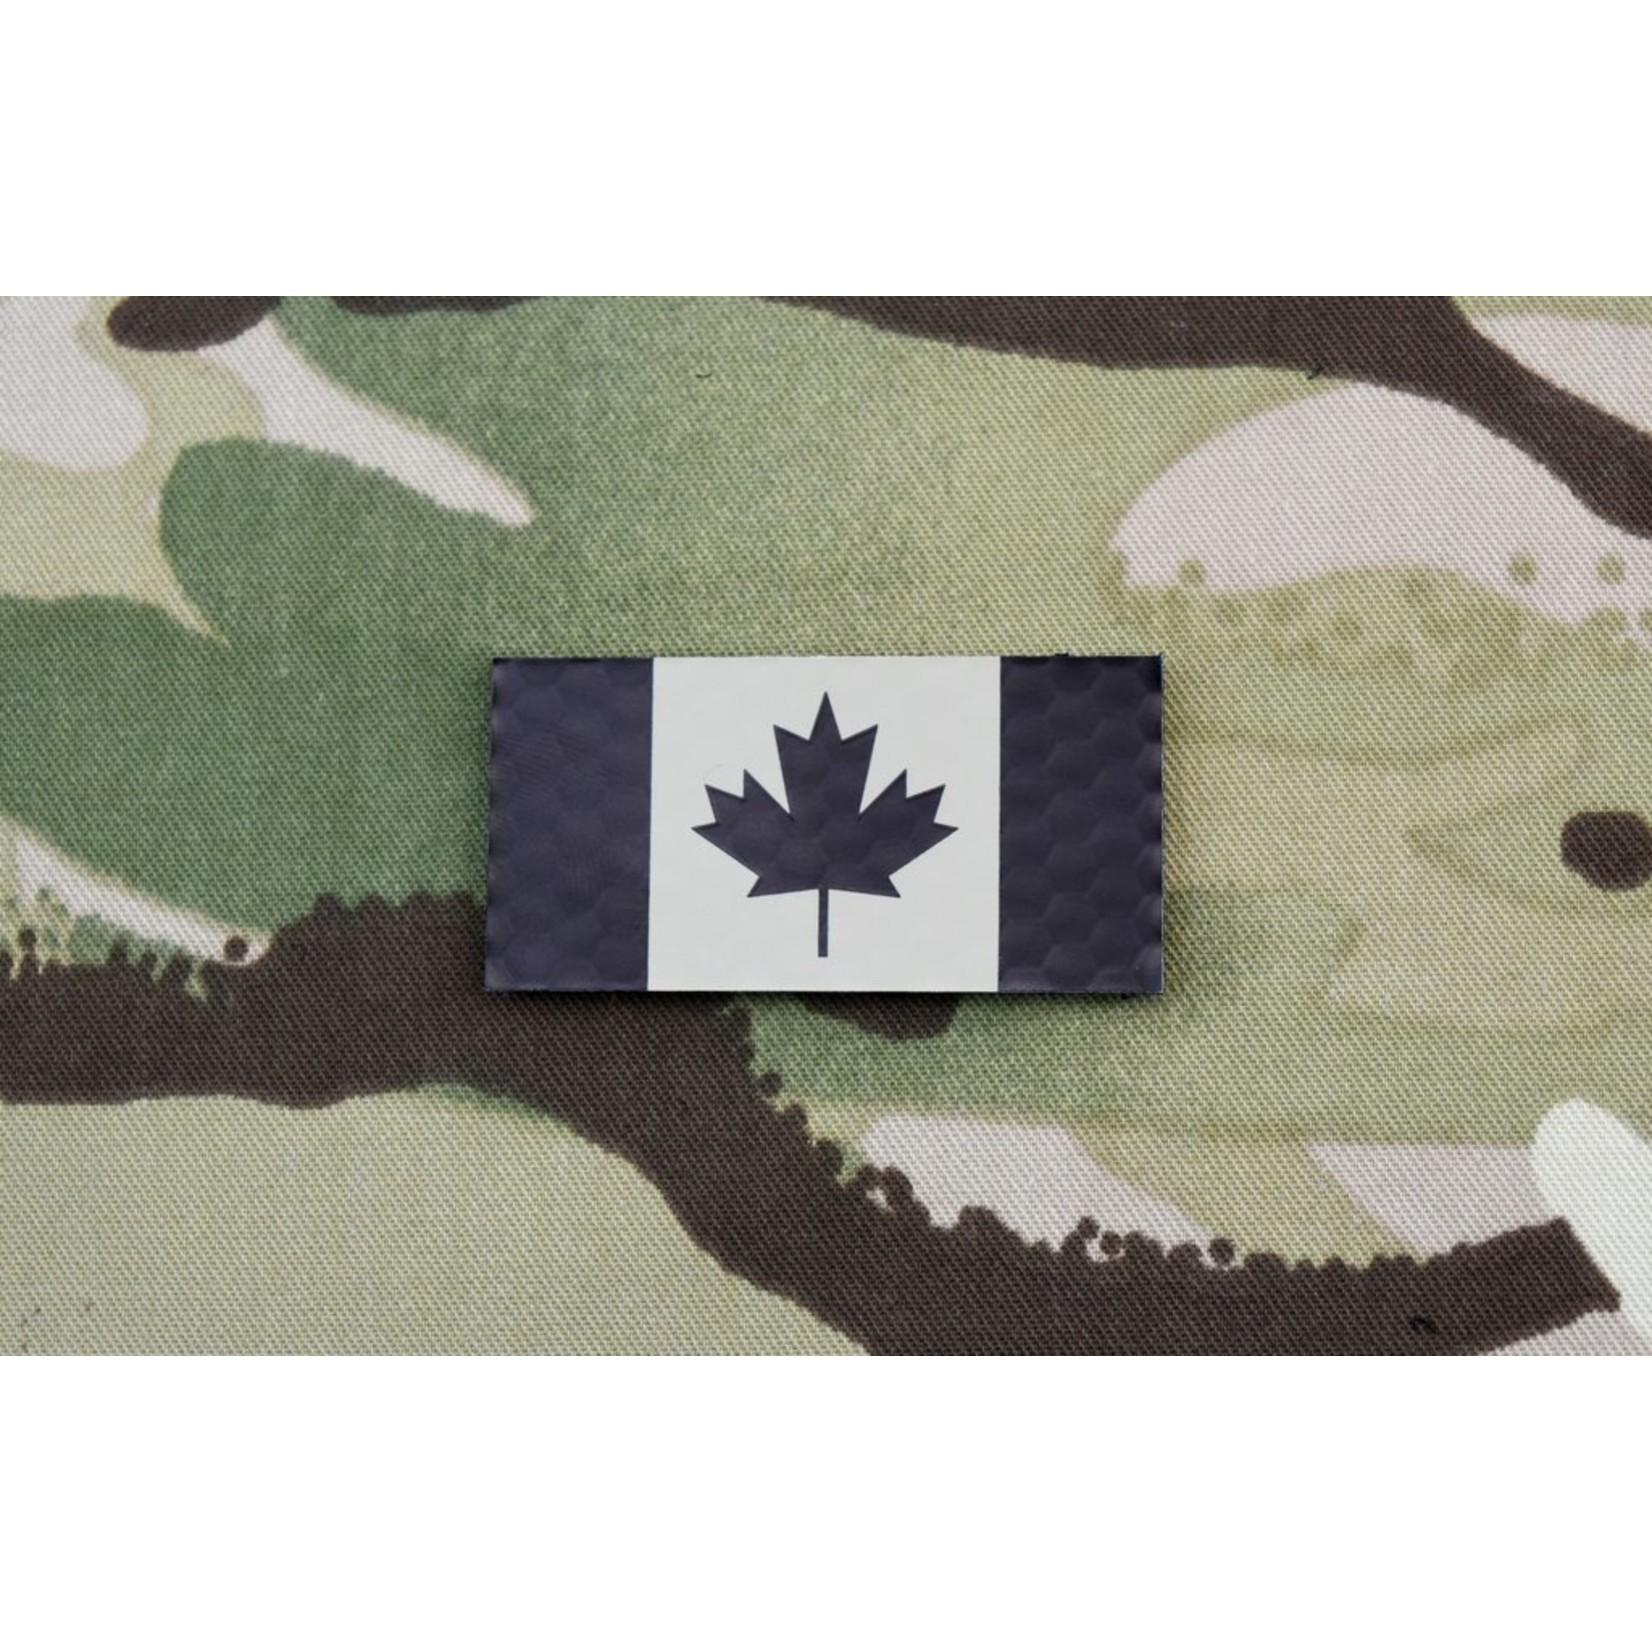 SDTAC INFRARED MINI CANADIAN FLAG PATCH - TAN & BLACK